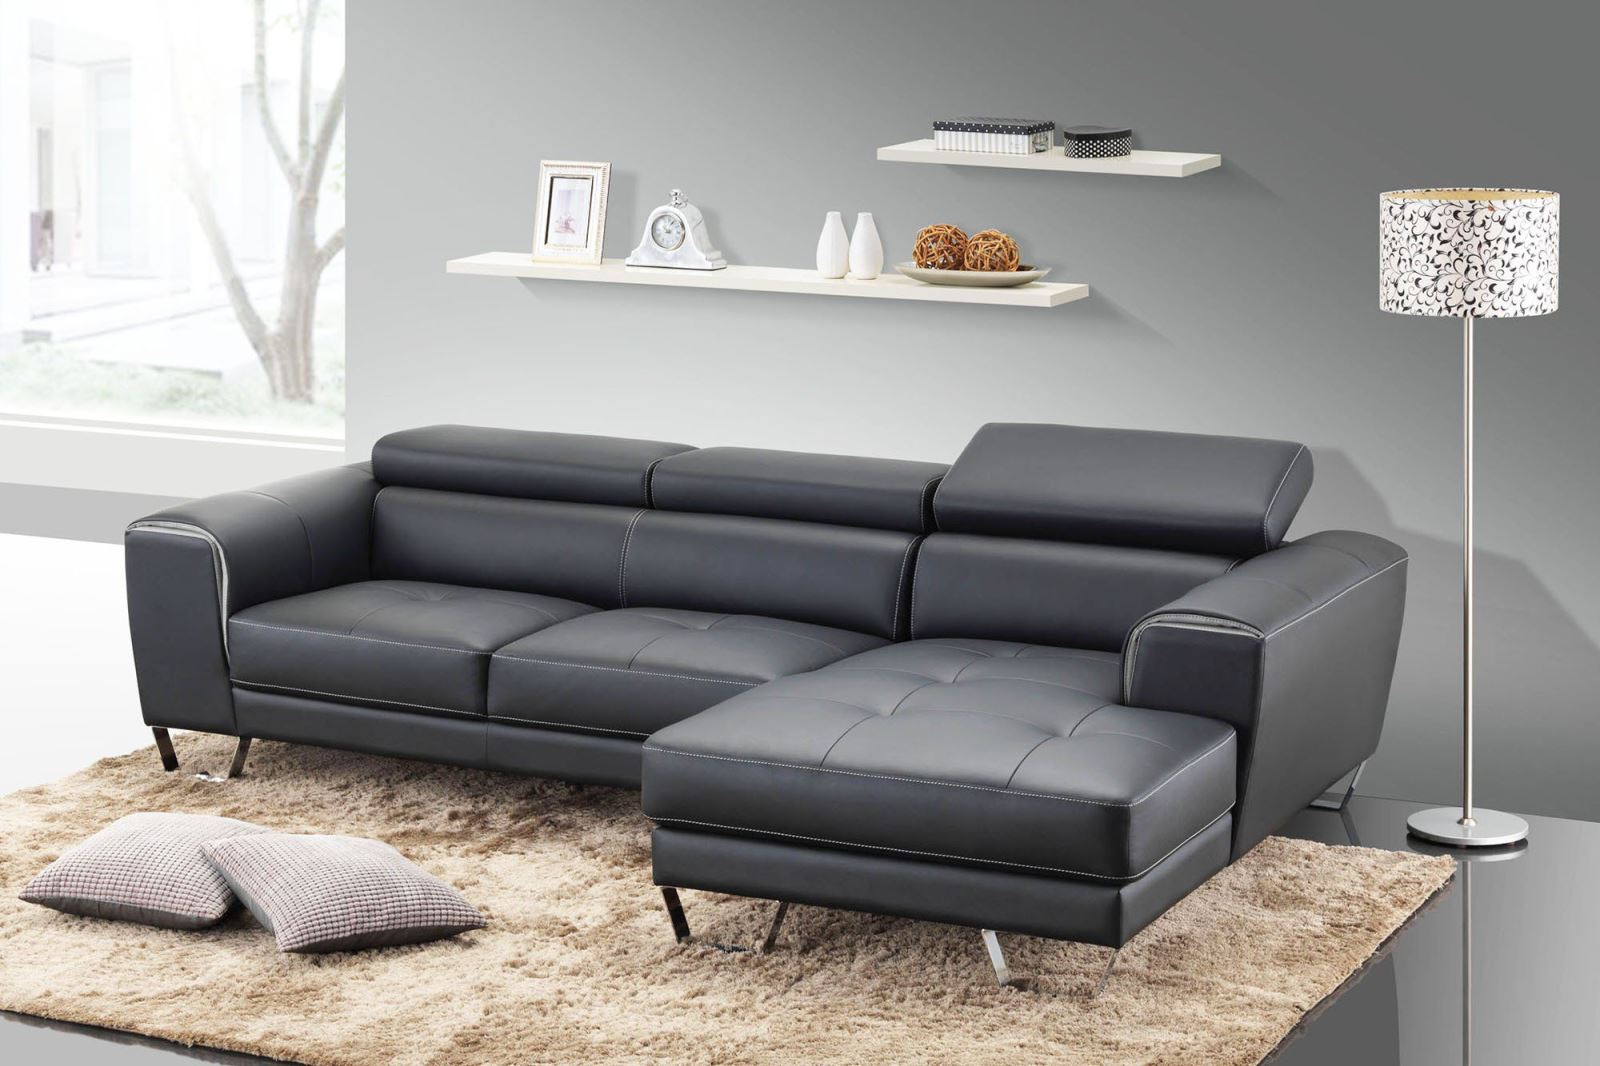 Sofa da thật 100 đen sang trọng